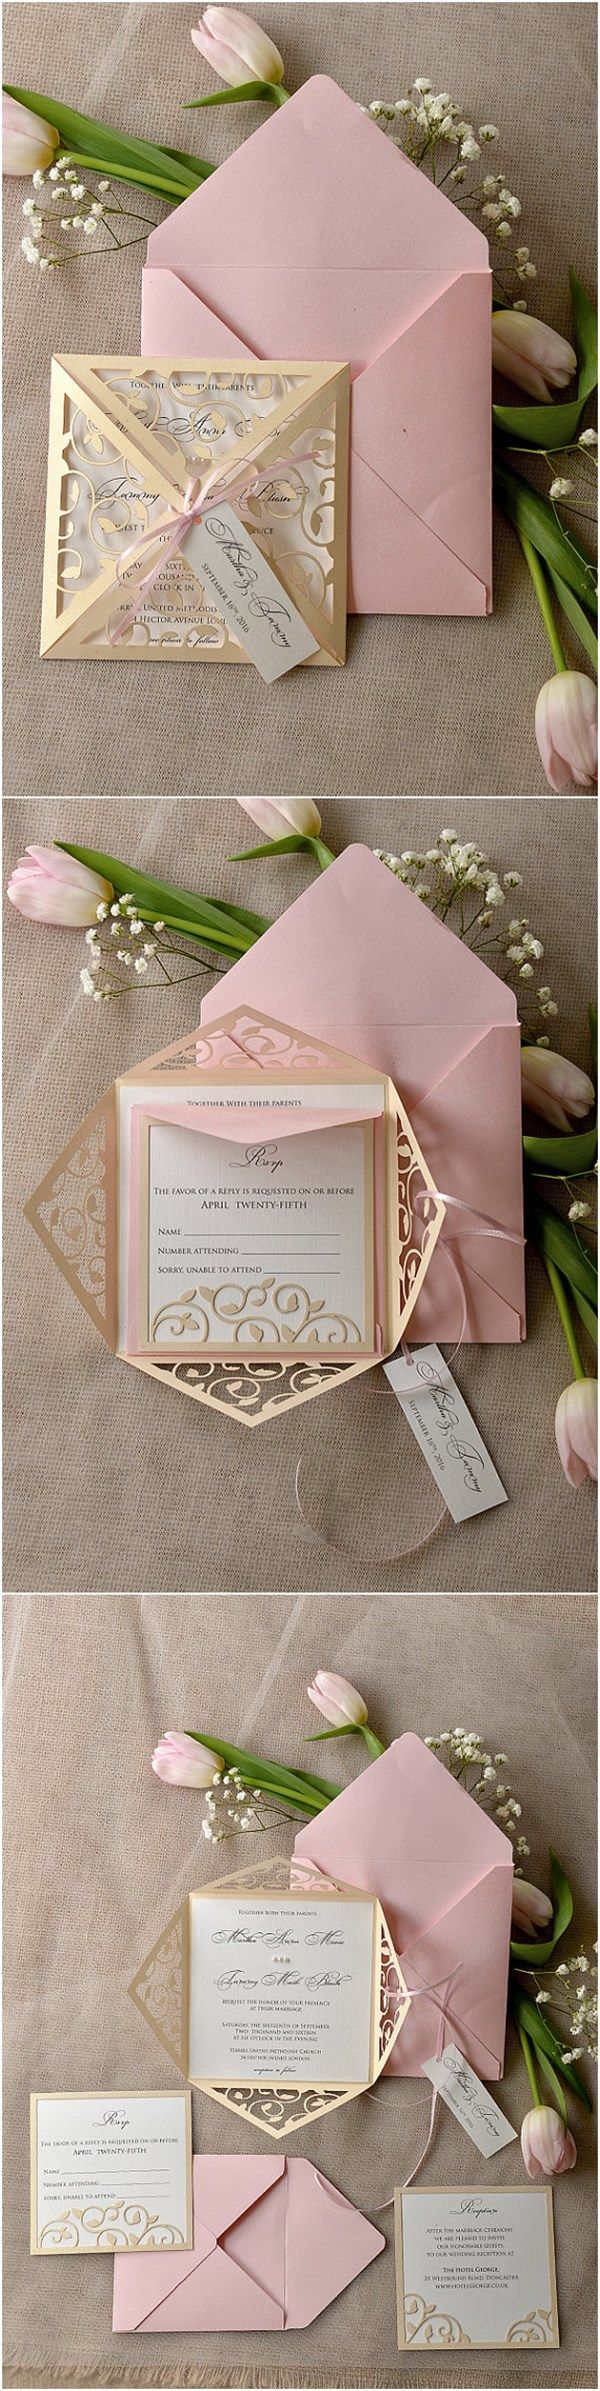 Wedding invitations wedding invitation purple gold ornate - Vintage Patel Pink Blush Gold Laser Cut Wedding Invitation